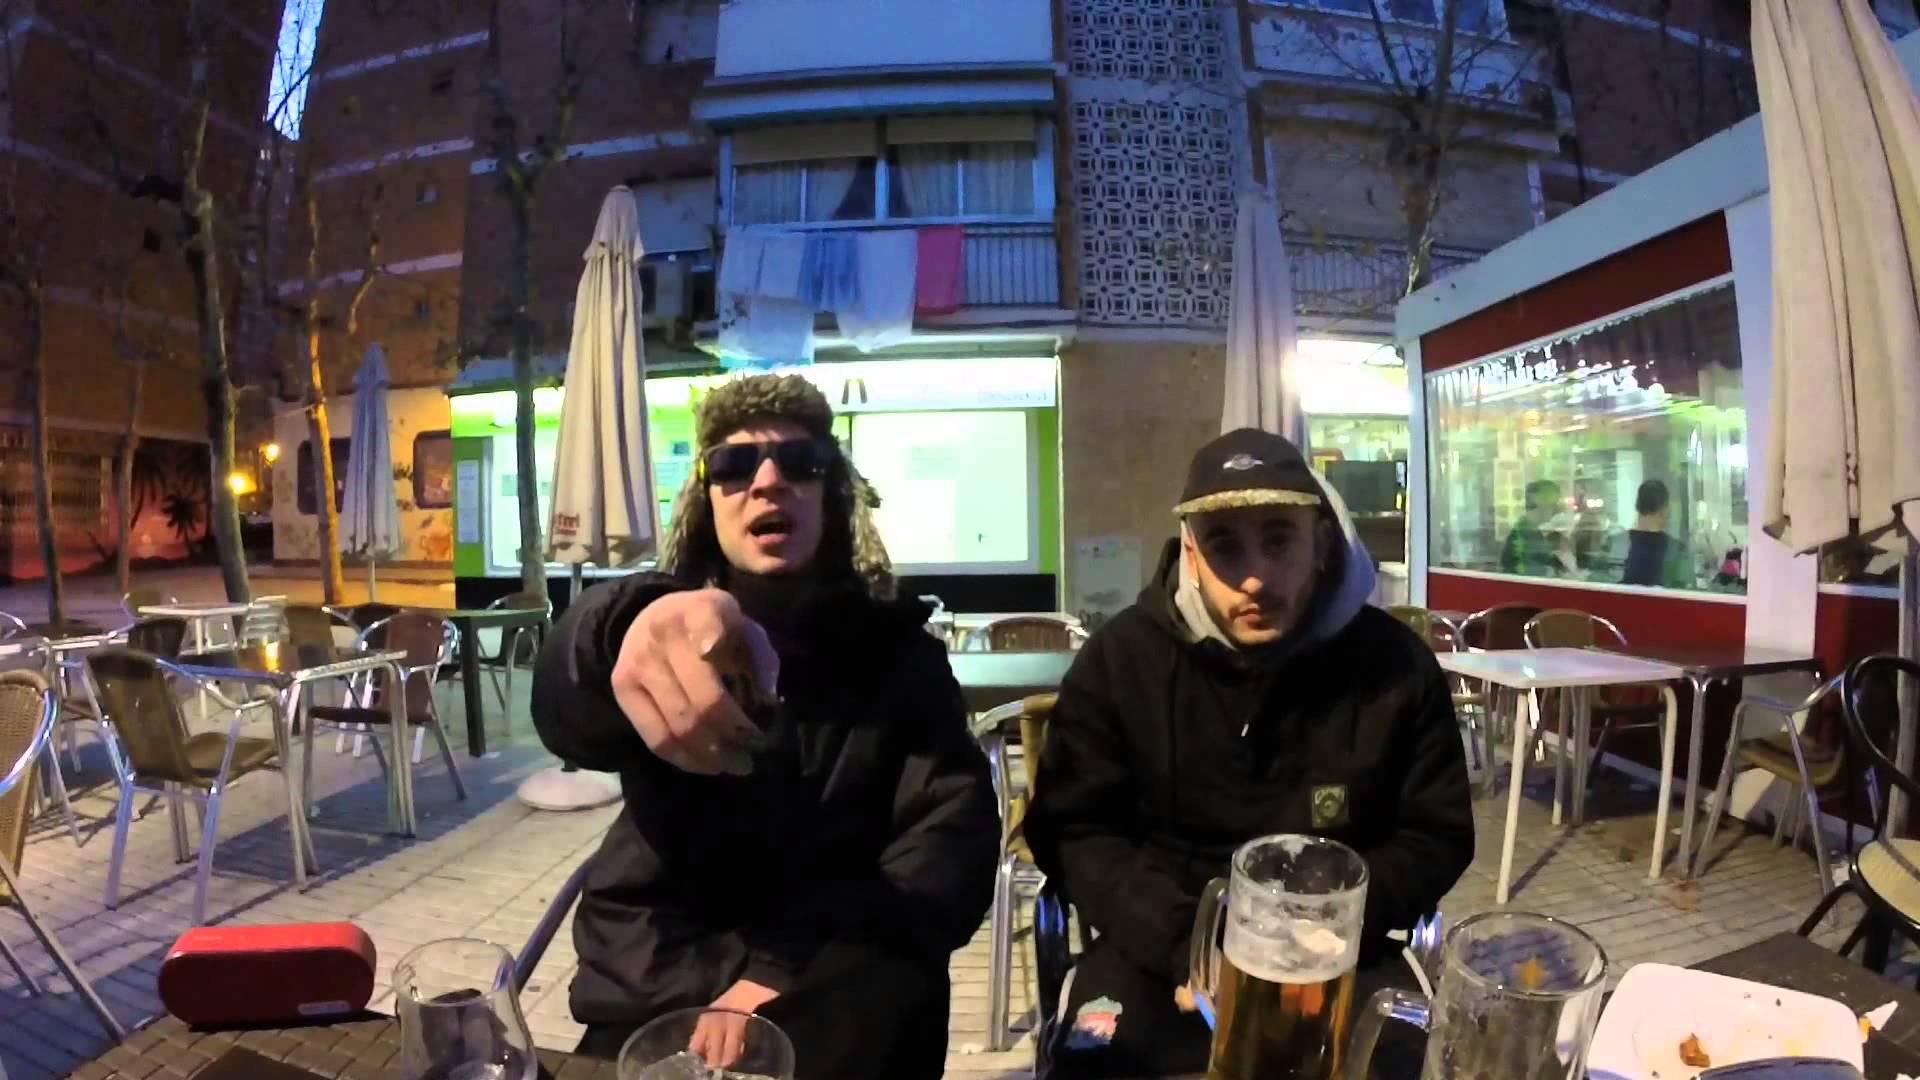 Natos y Waor – Sigo vivo (Remix)